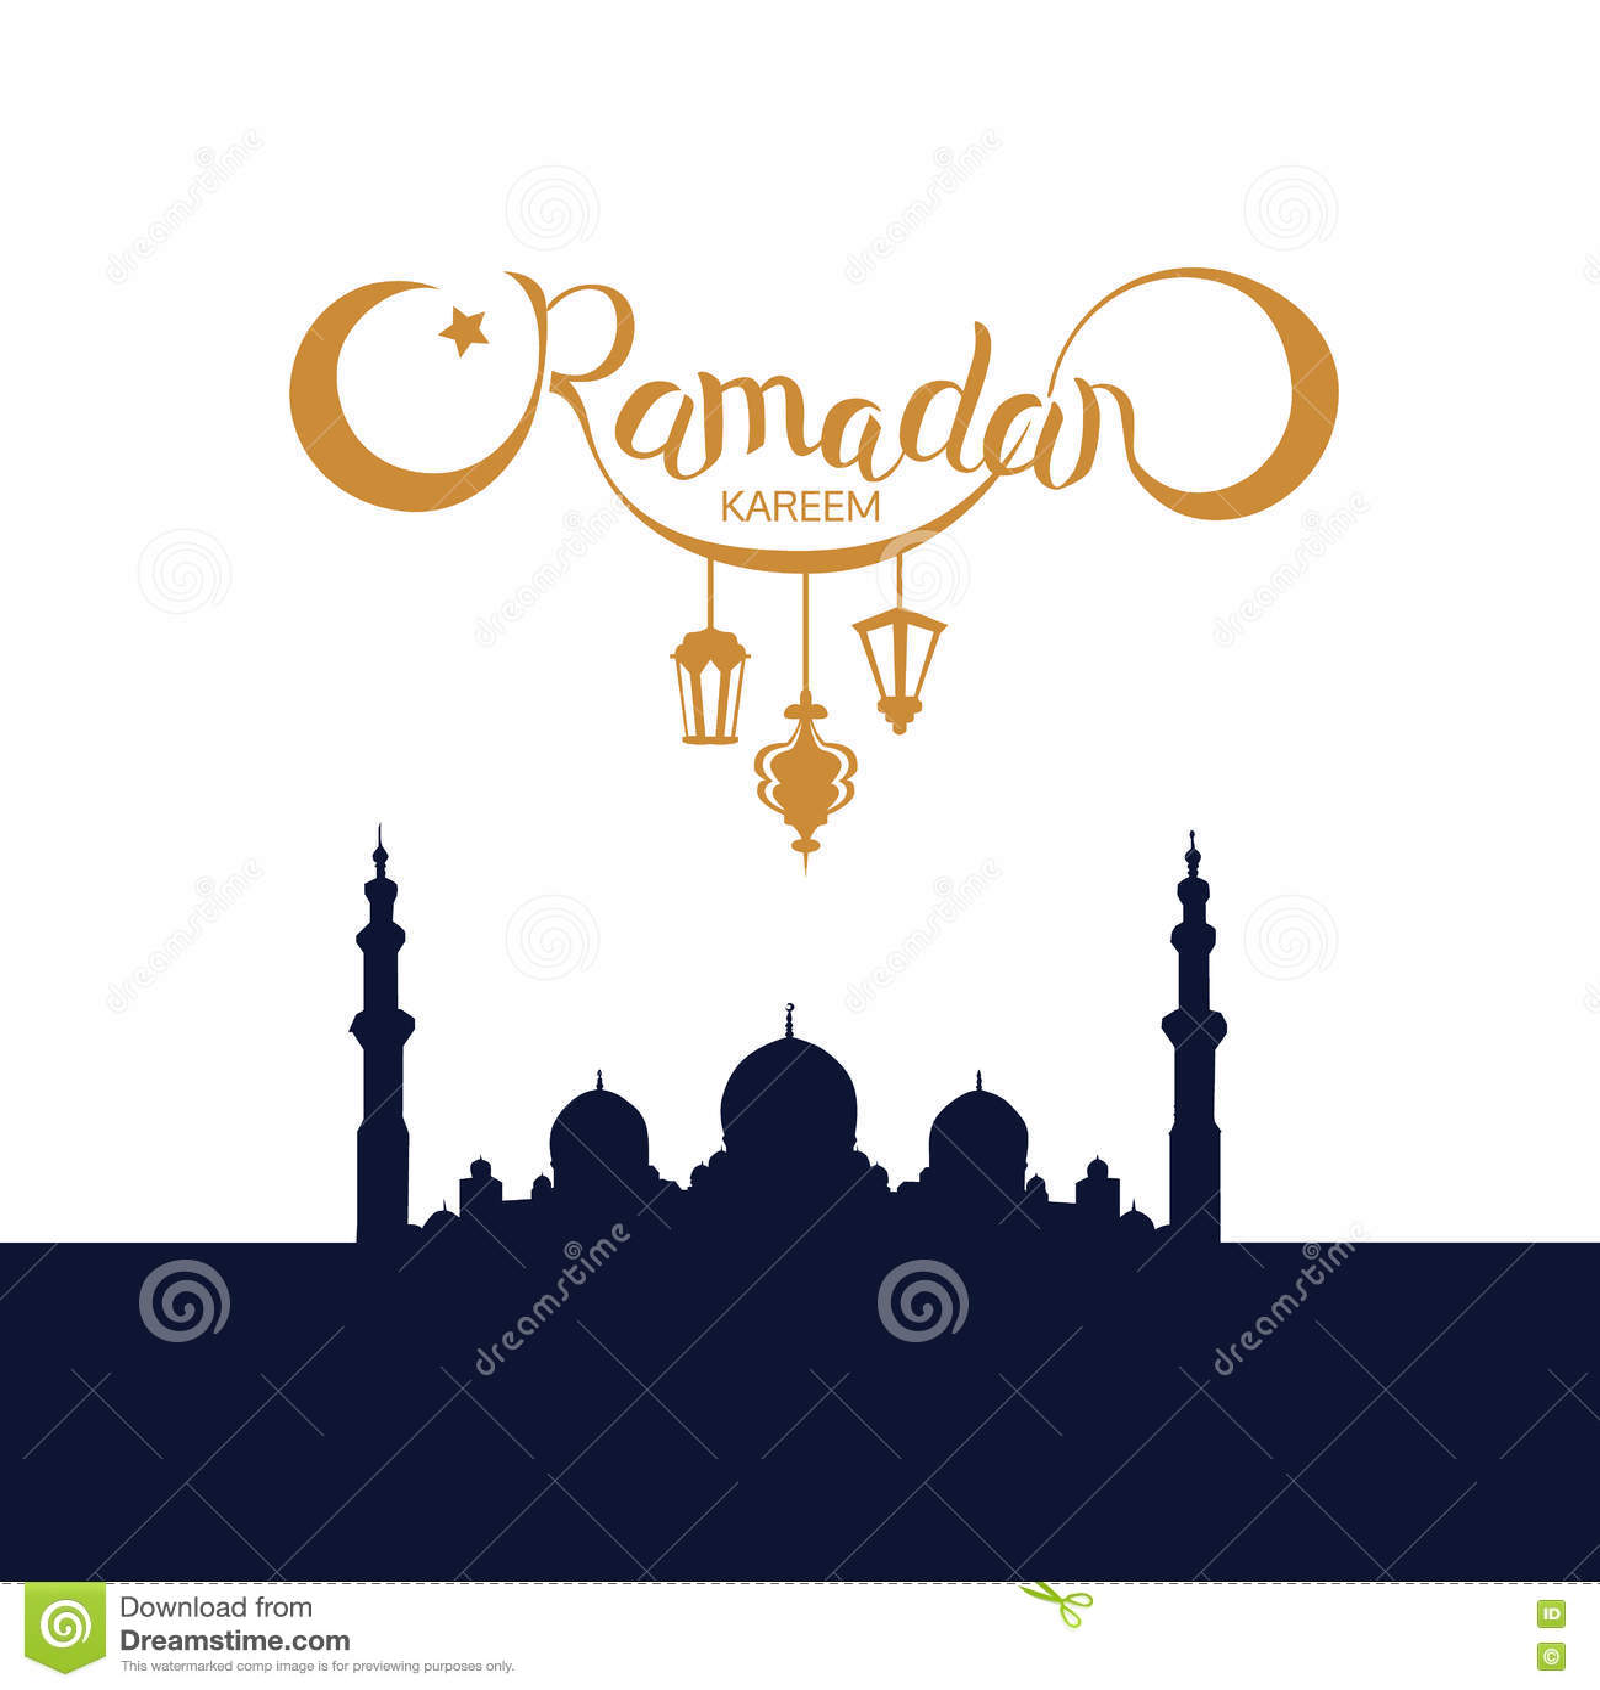 Mosque background for ramadan kareem stock photography image - Vector Ramadan Kareem Lettering On Dark Mosque Silhouette Background Stock Vector